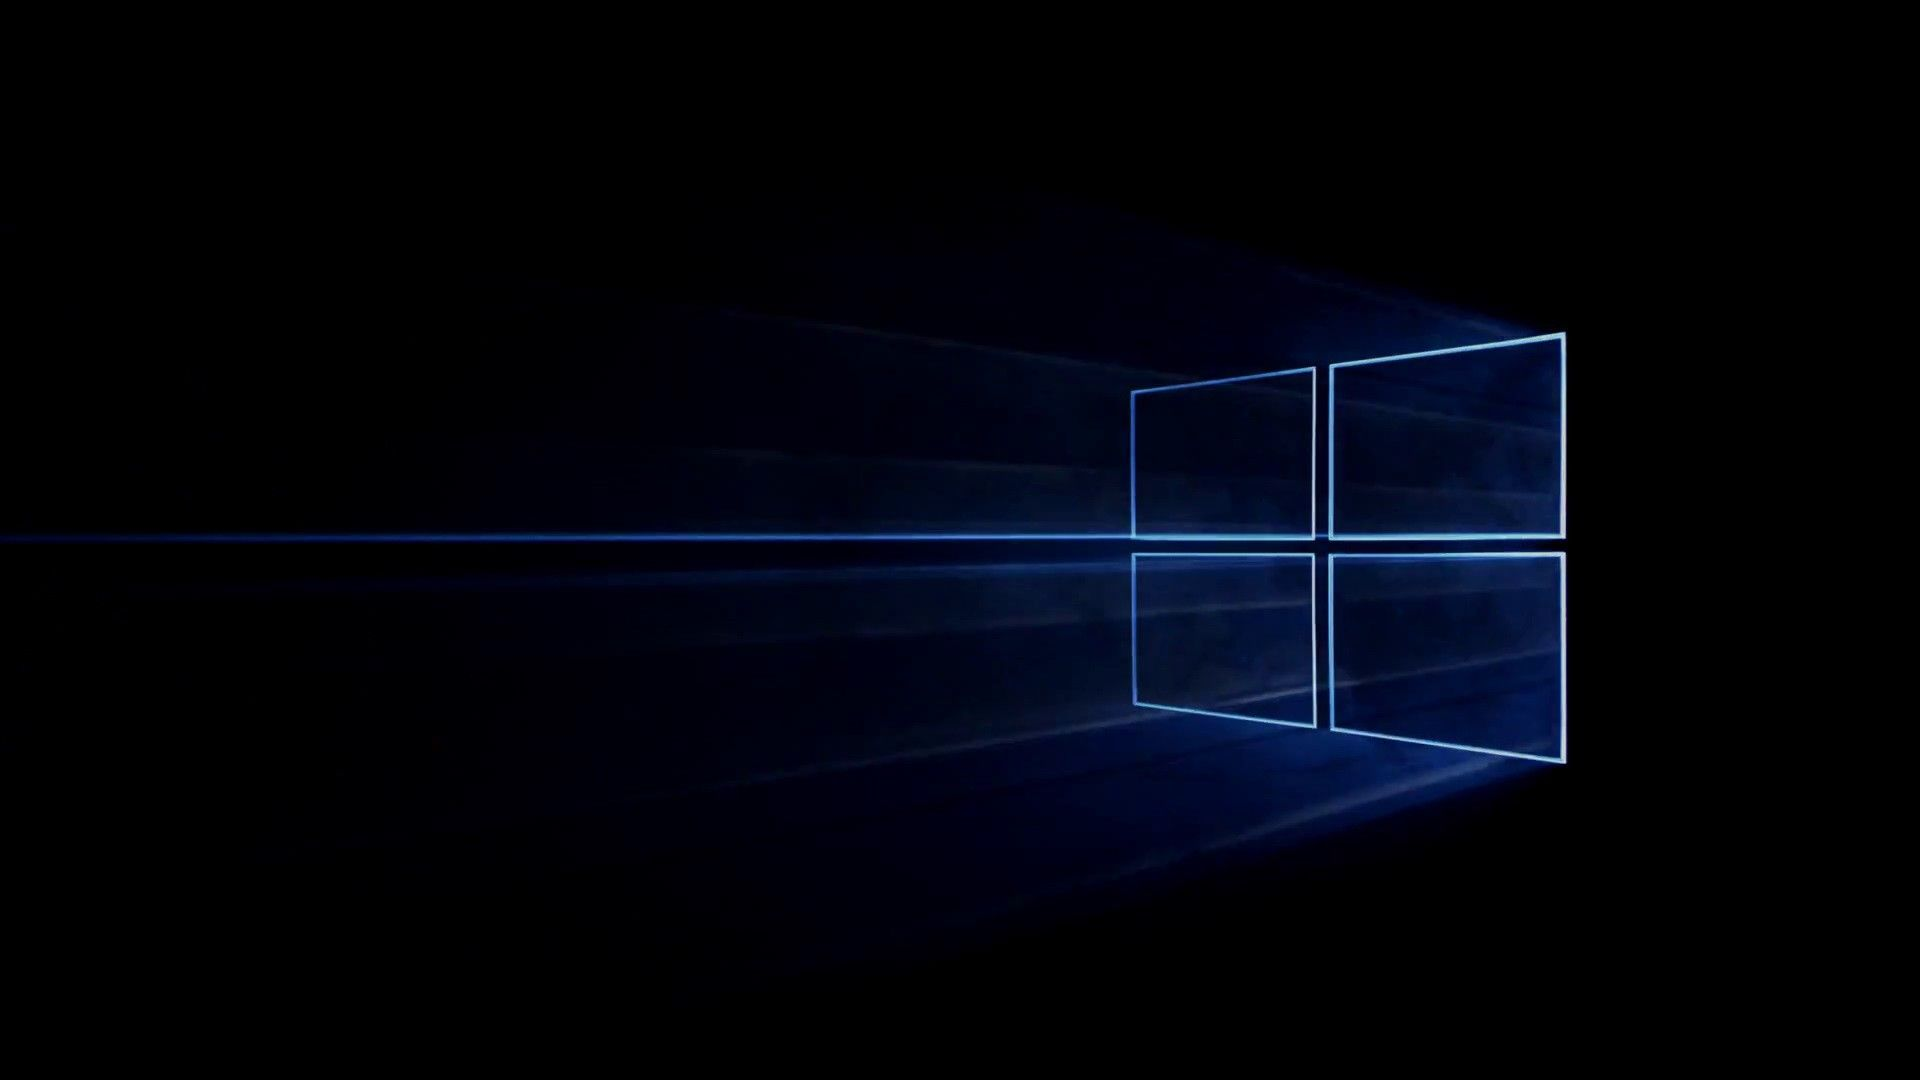 Windows 10 Wallpaper Hd 1920x1080 For 4k Wallpaper Windows 10 Windows Wallpaper Windows 10 Logo